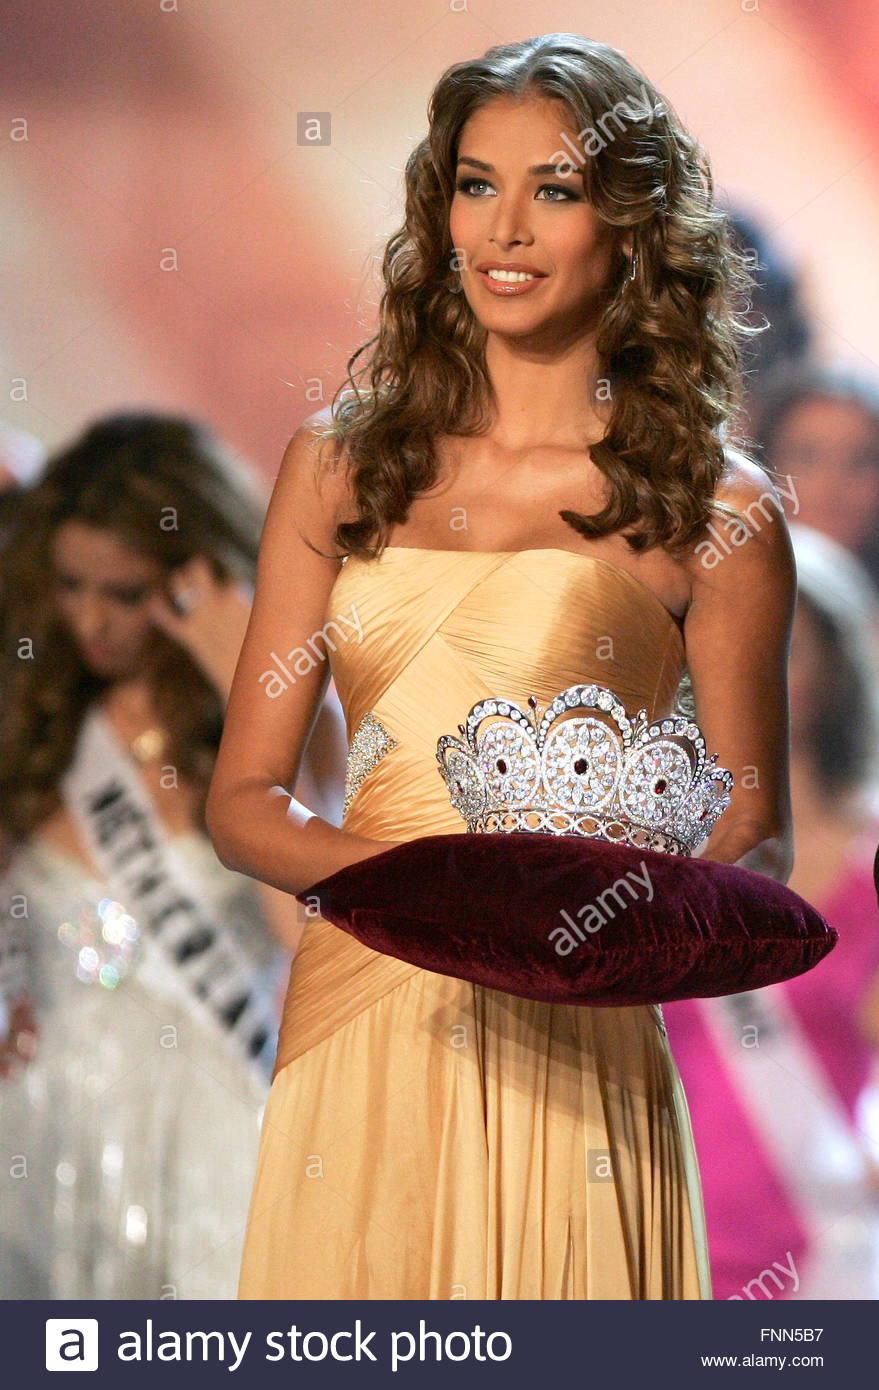 dayana mendoza, miss universe 2008. - Página 35 Epa01835680-miss-universe-2008-venezuelan-dayana-mendoza-hands-her-FNN5B7_rwy3